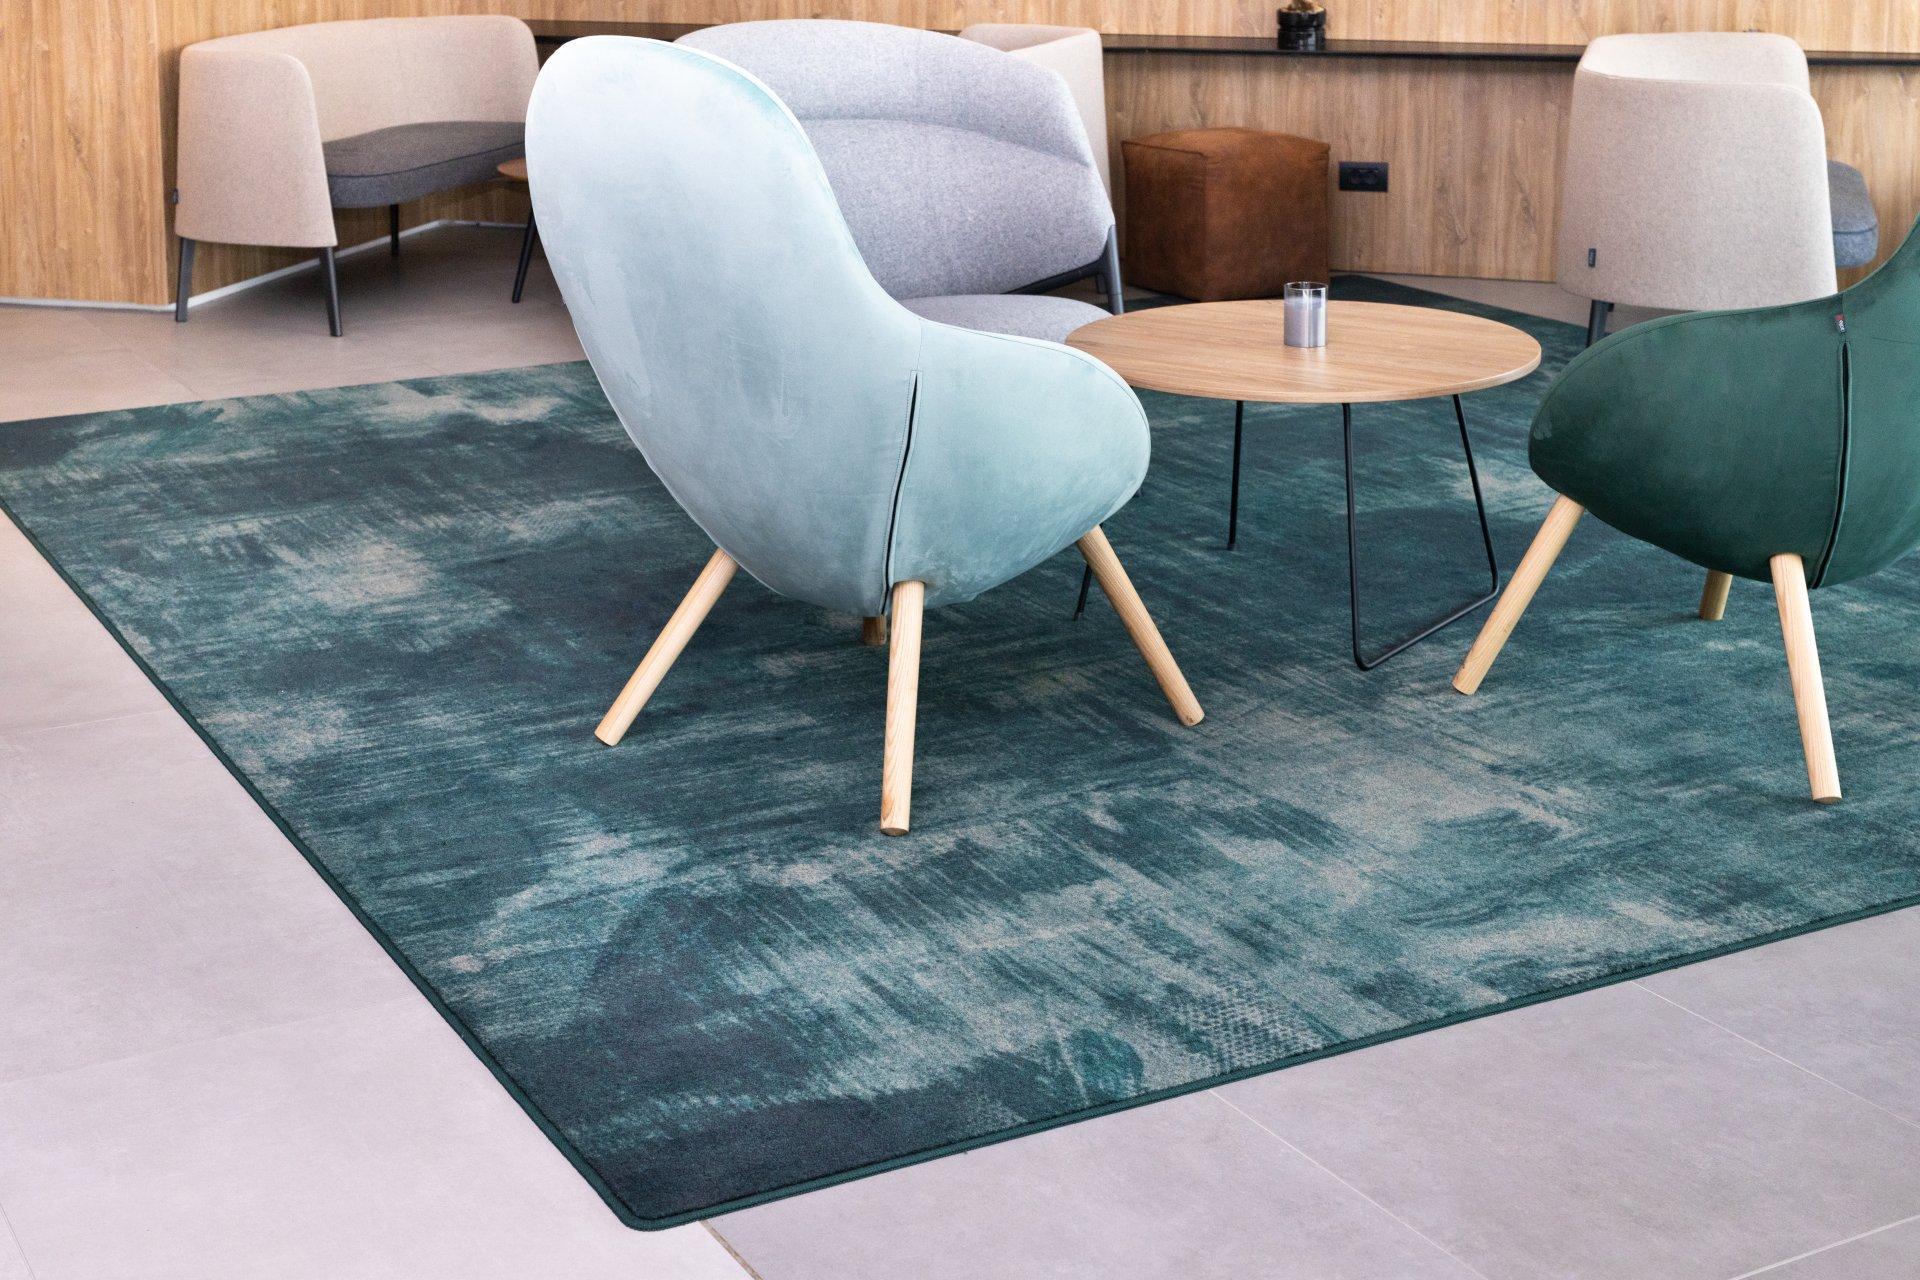 20200625-carpet-and-more-hilton-otopeni-37